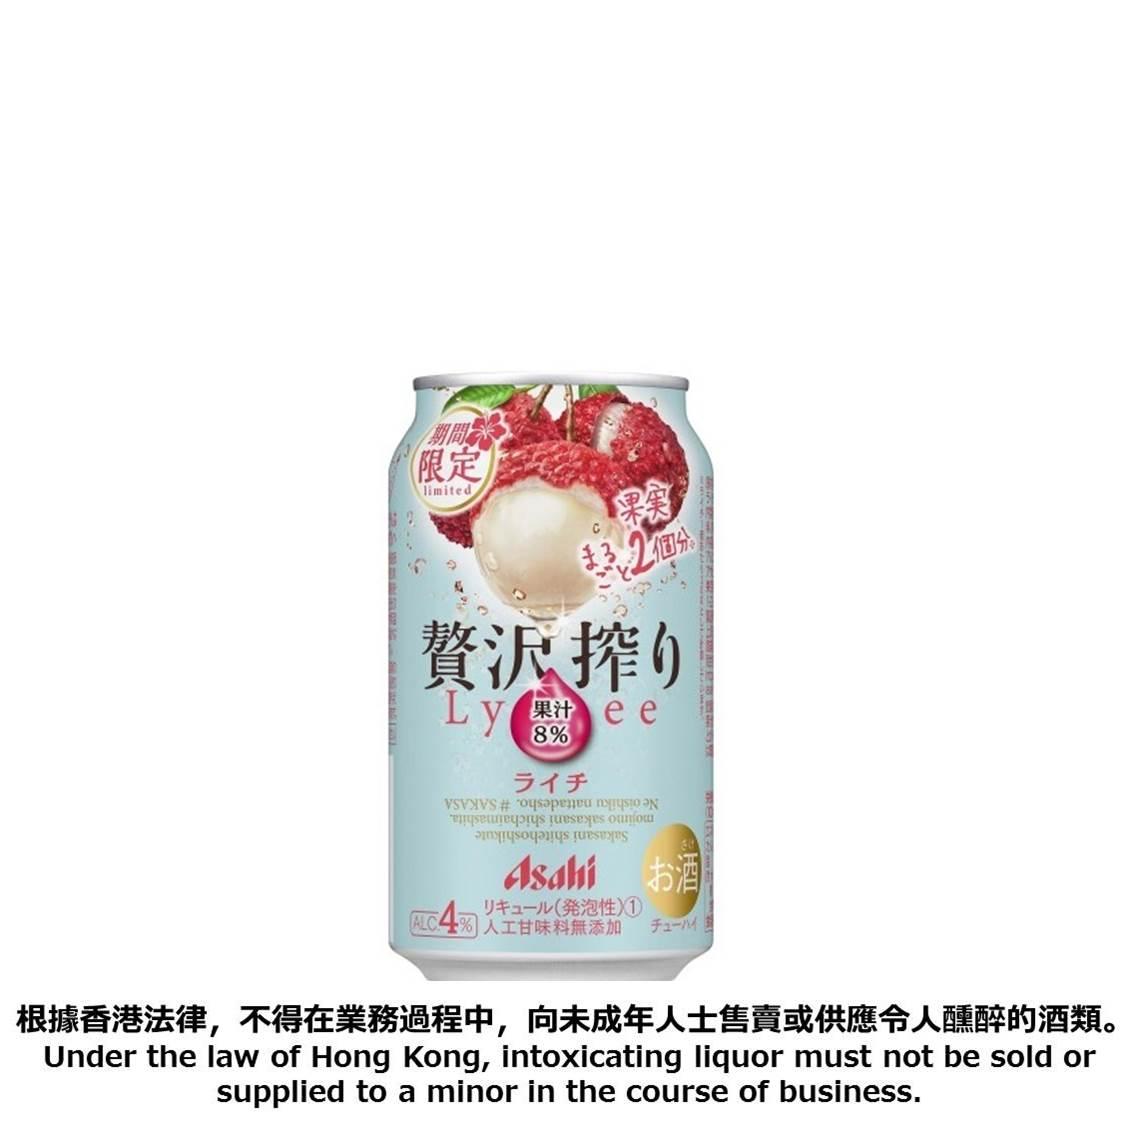 ASAHI贅尺荔枝果實酒350ML